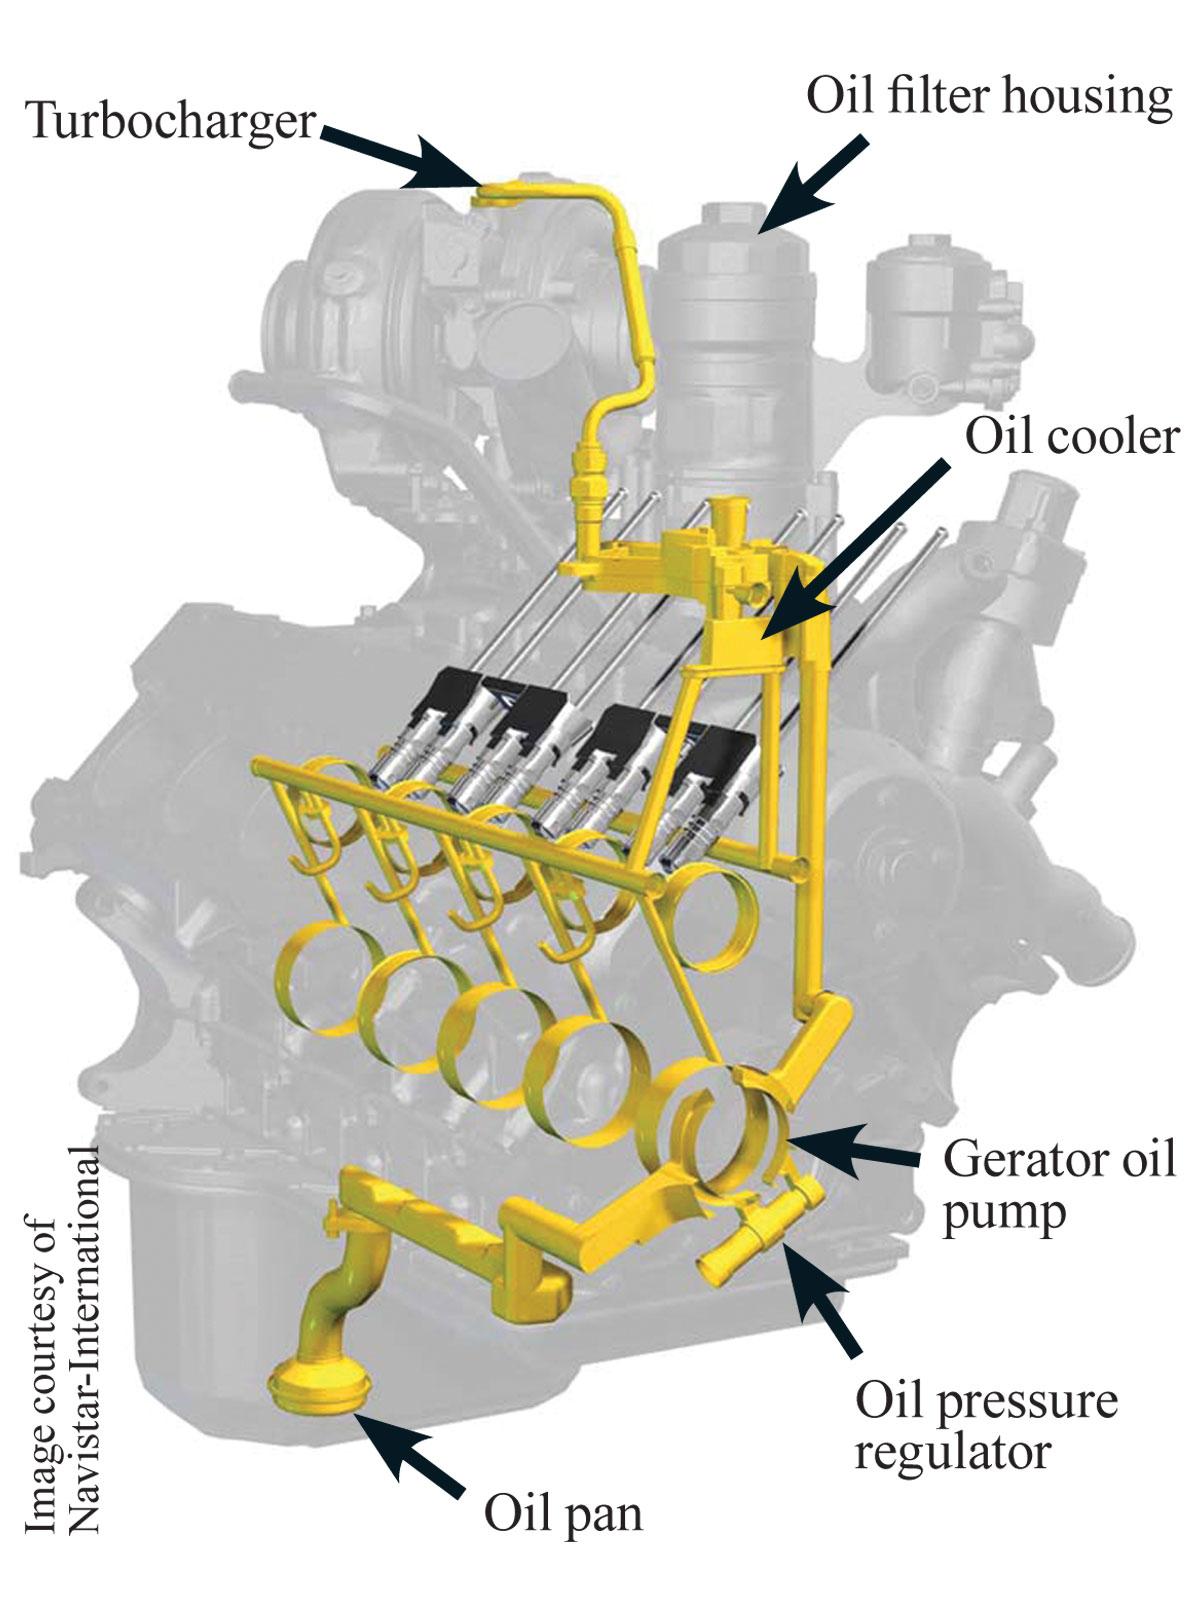 International 6 0 Engine Diagram - Wiring Diagram Perfomance on